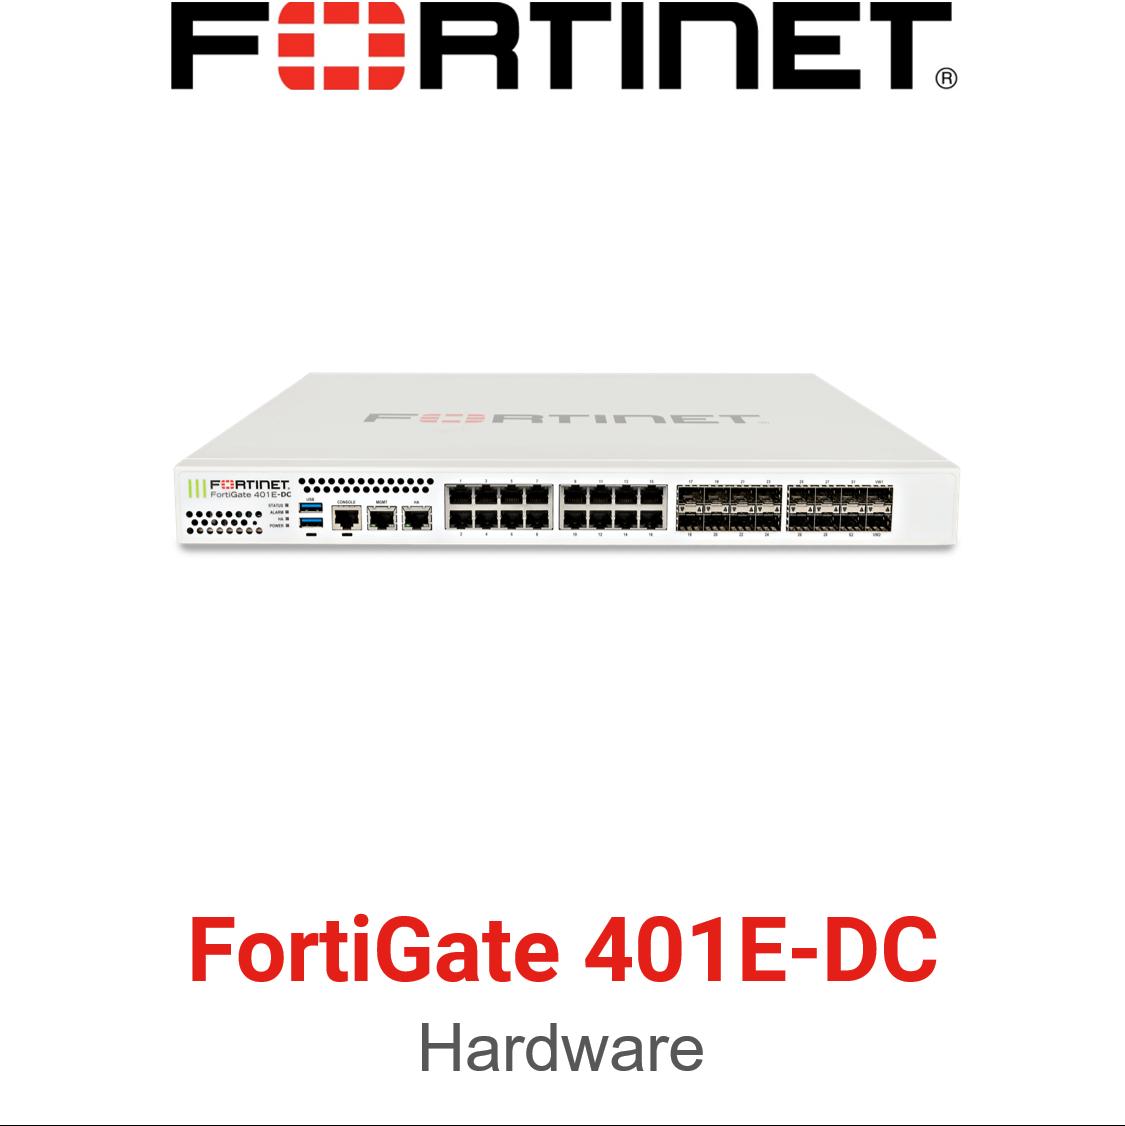 Fortinet FortiGate 401E DC Firewall